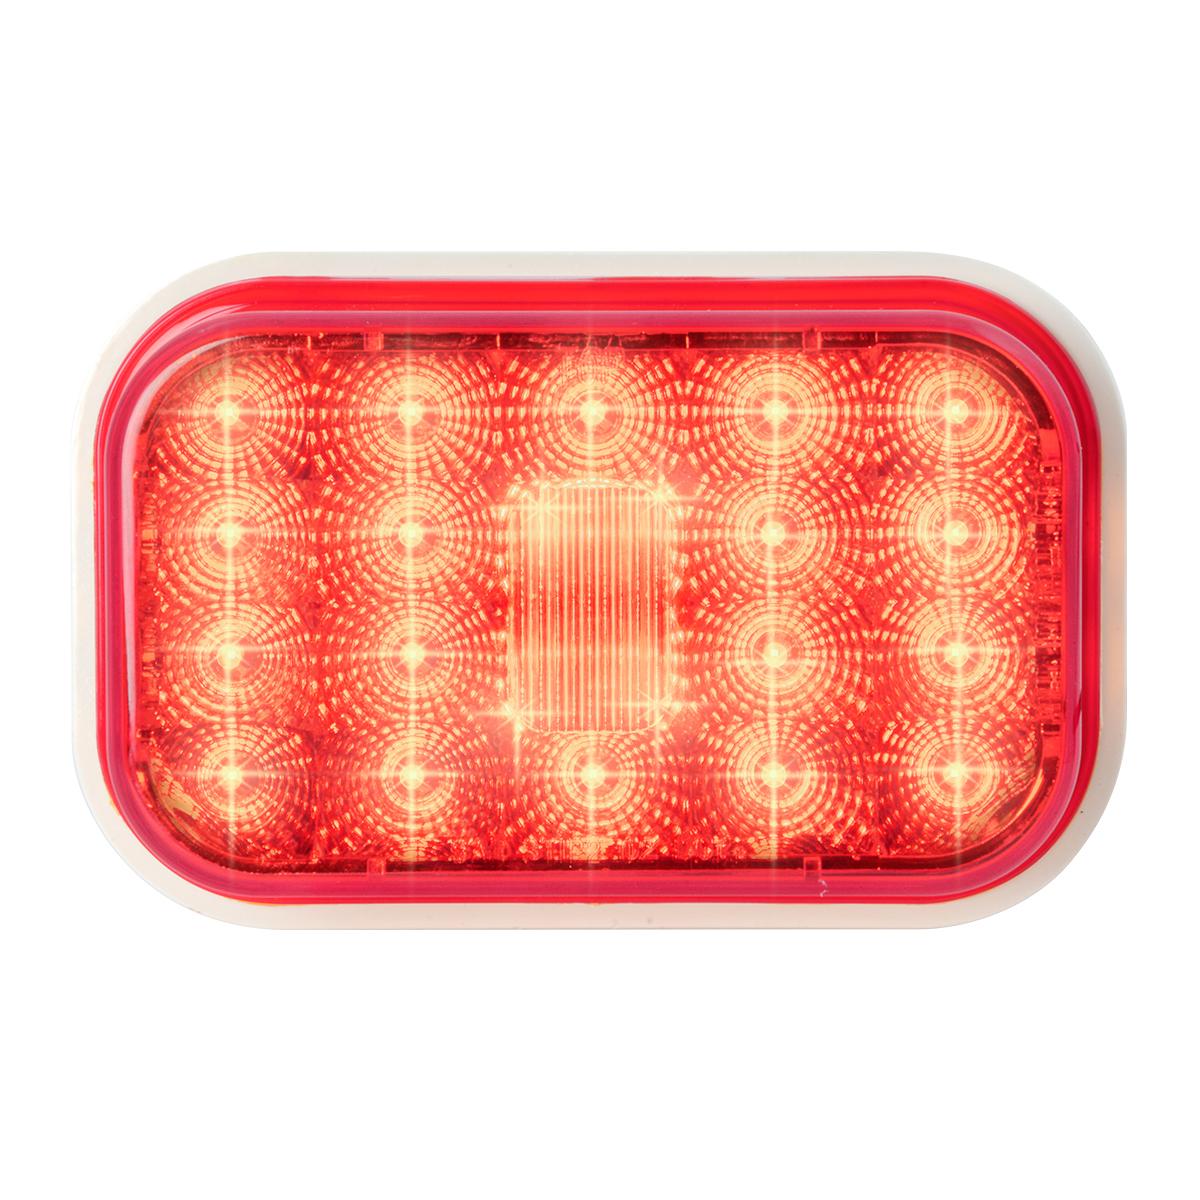 77463 High Profile Rectangular Spyder LED Light in Red/Red